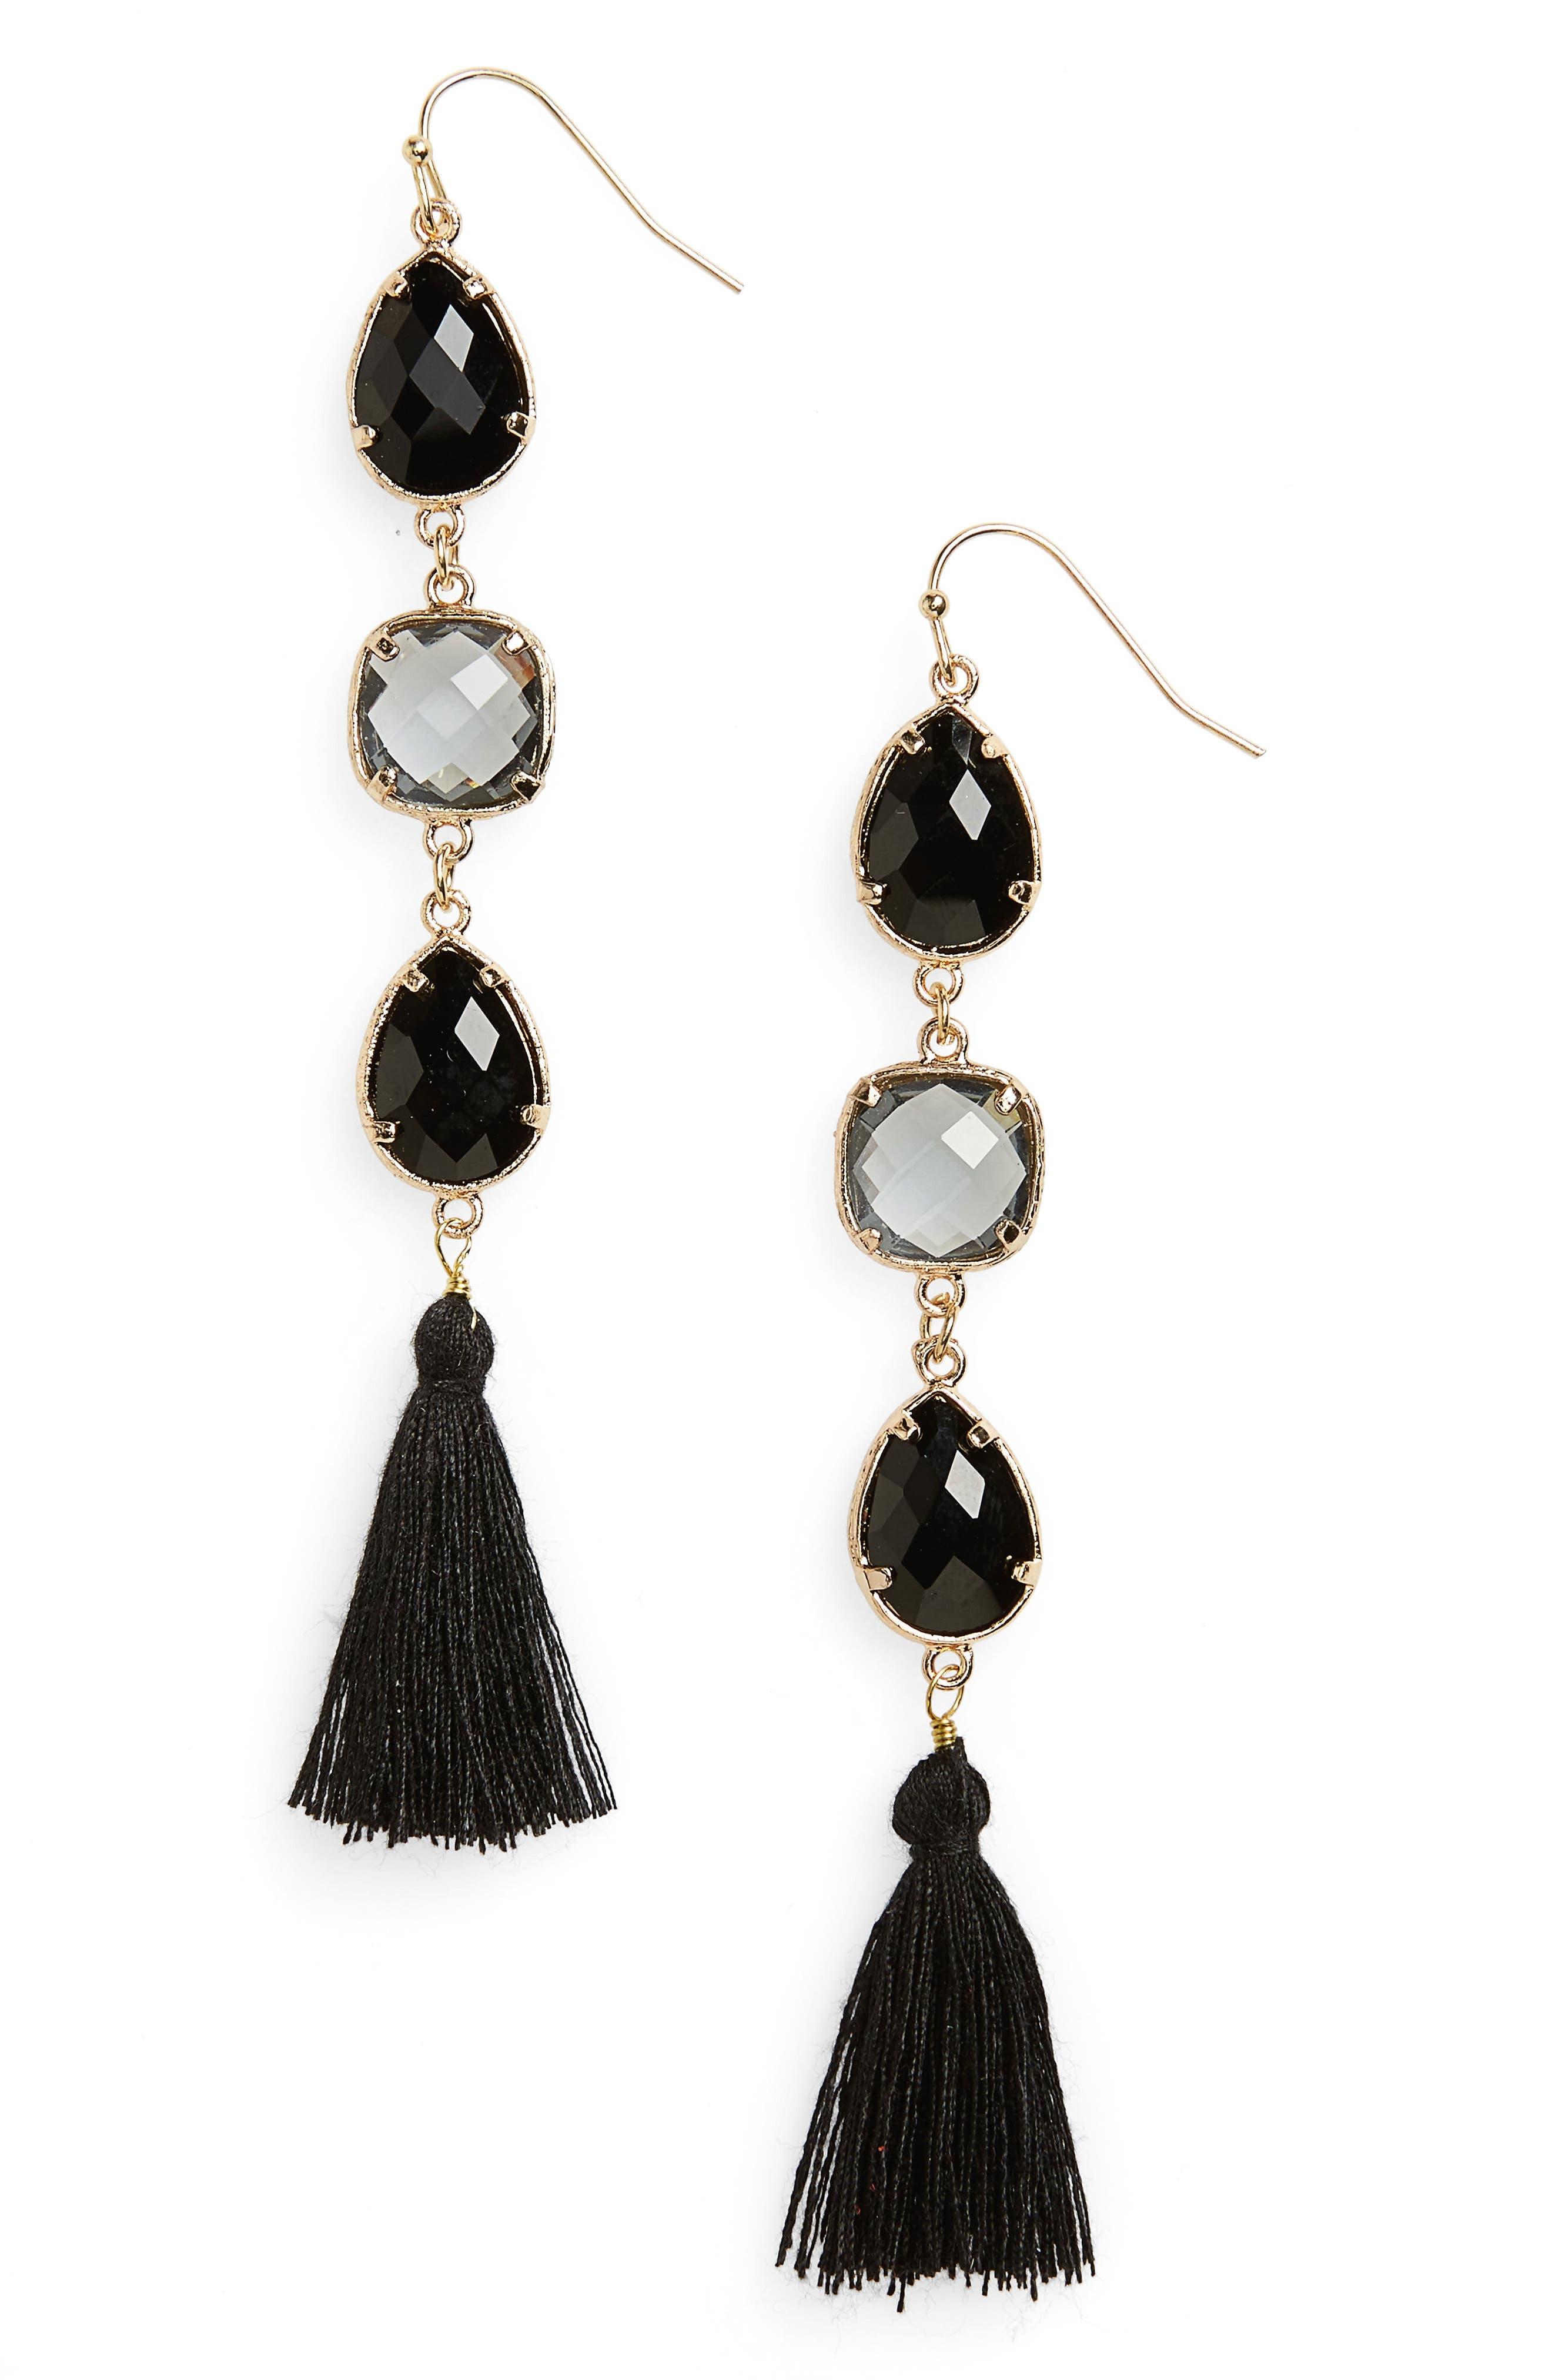 Crystal Tassel Earrings,                             Main thumbnail 1, color,                             710